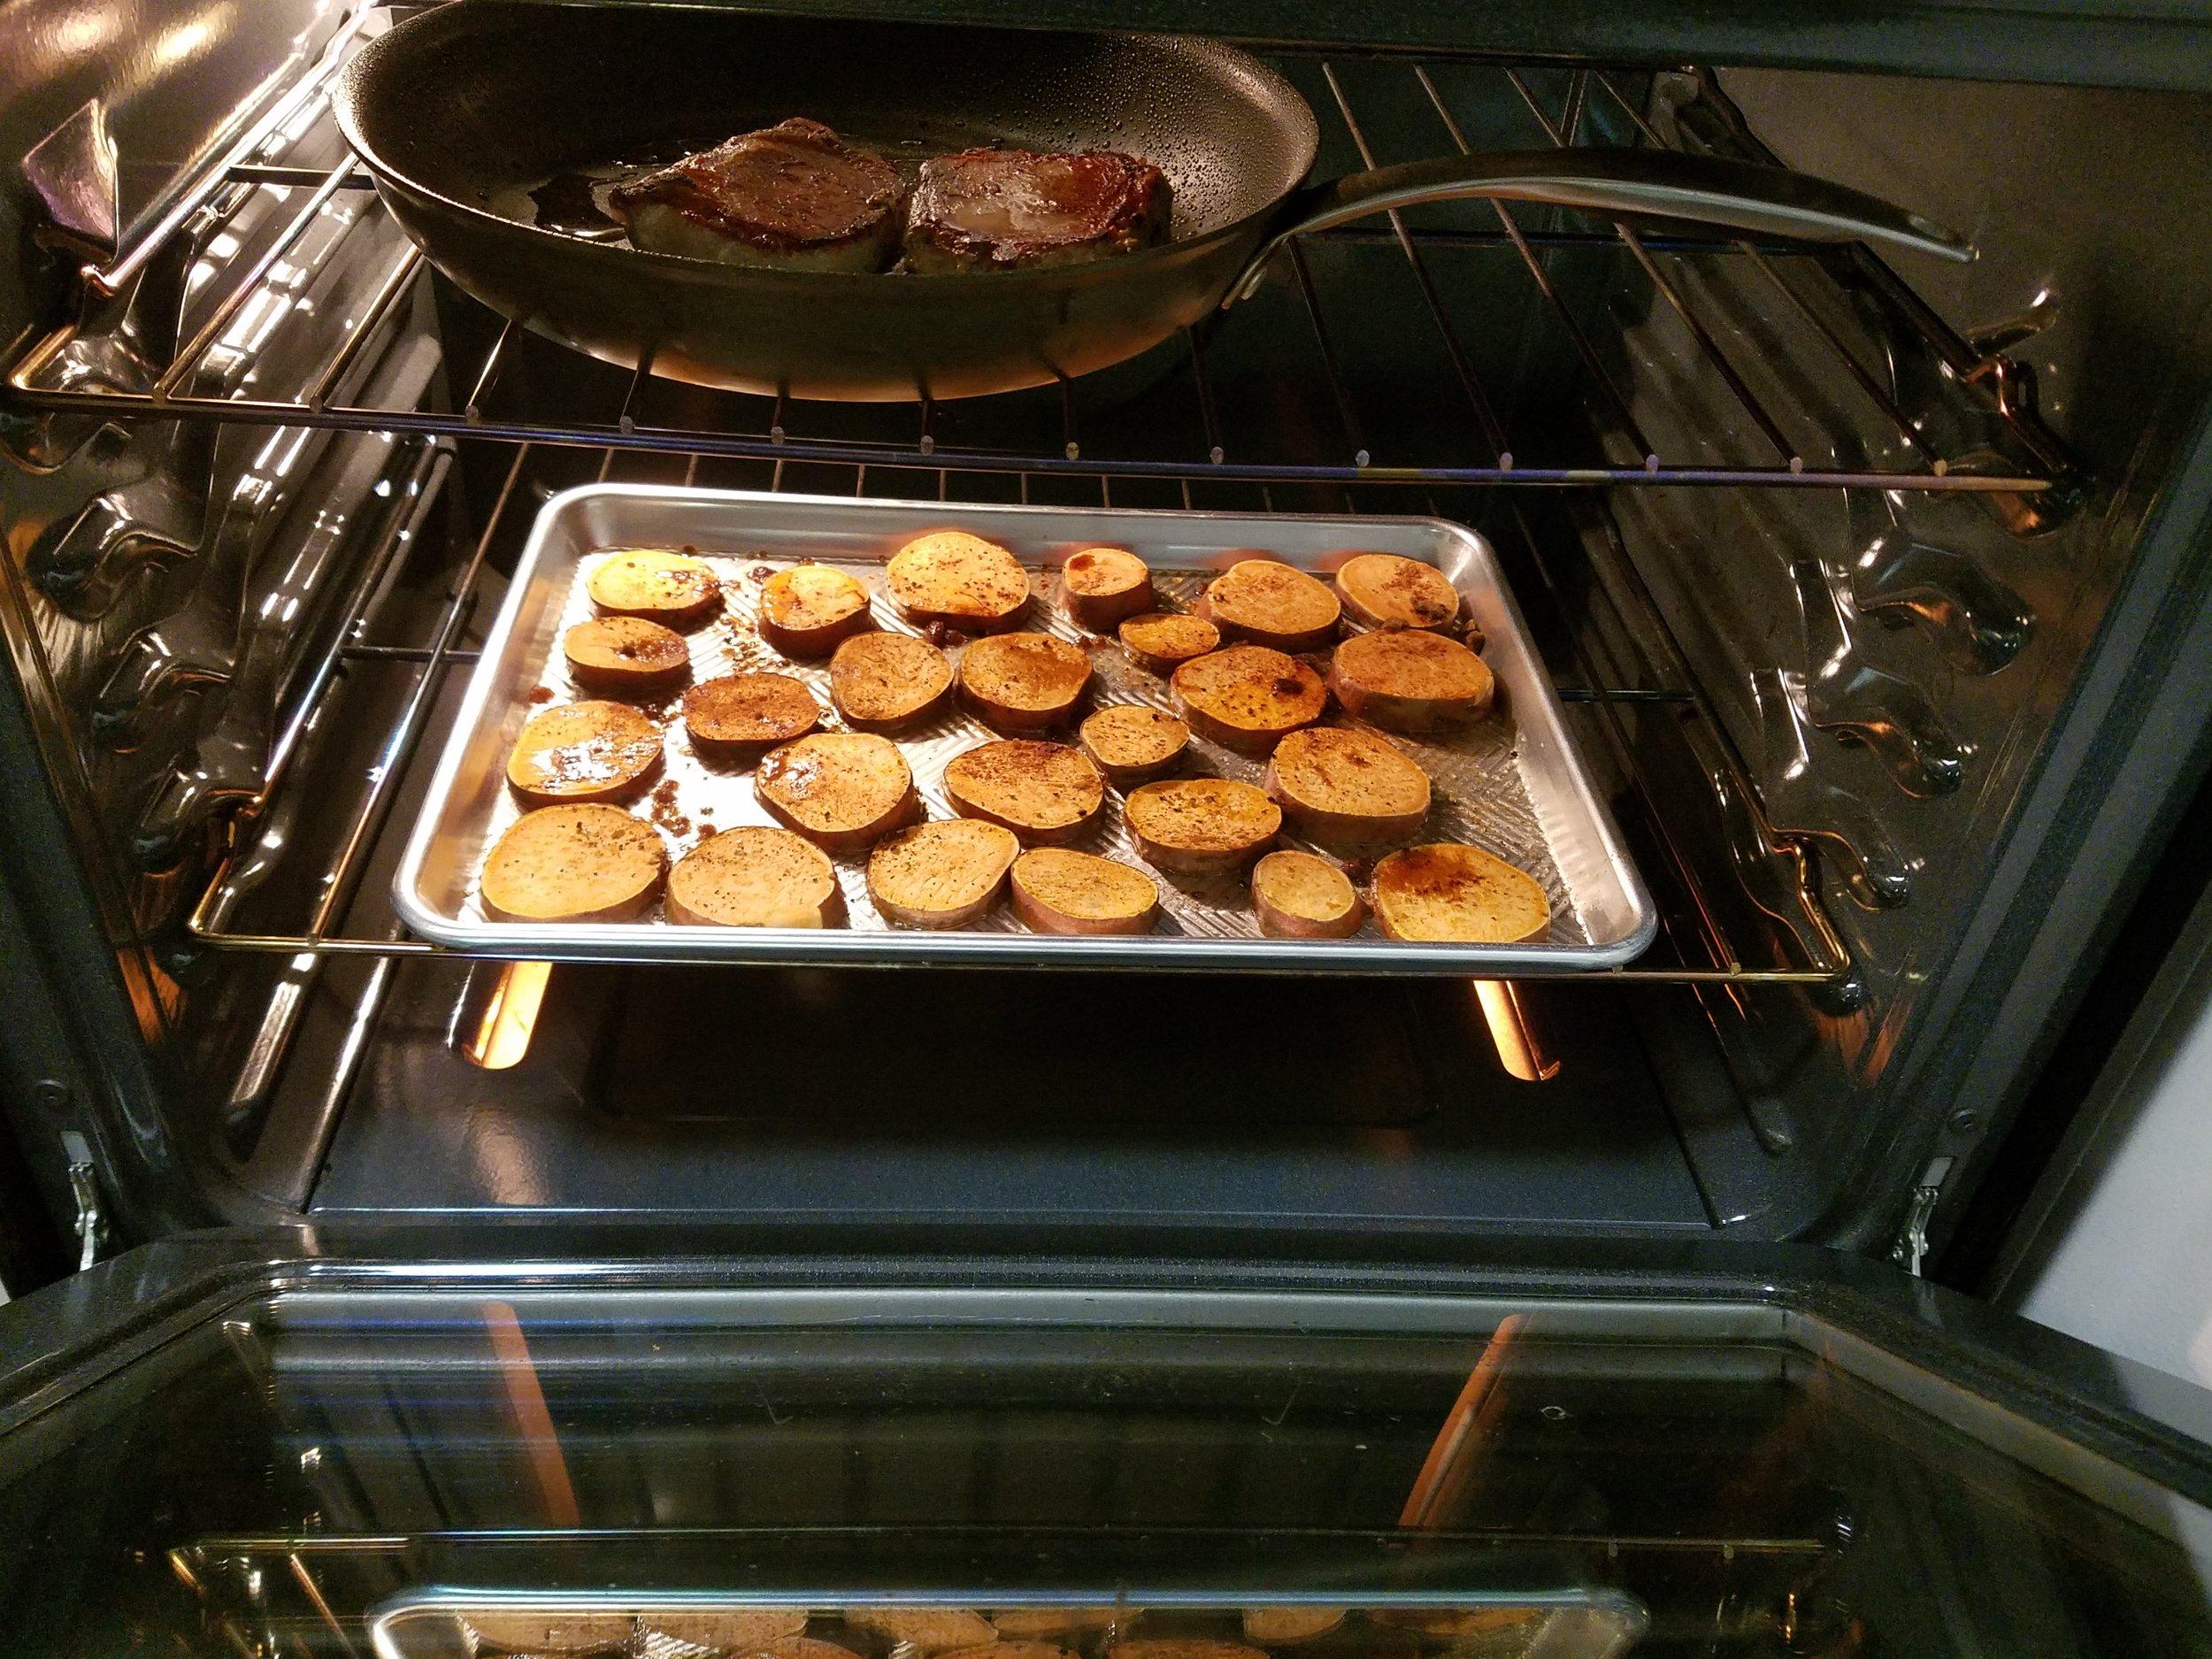 Chef_d Smoky Maple Pork Loin Roast Pork While Sweet Potatoes Cook.jpg